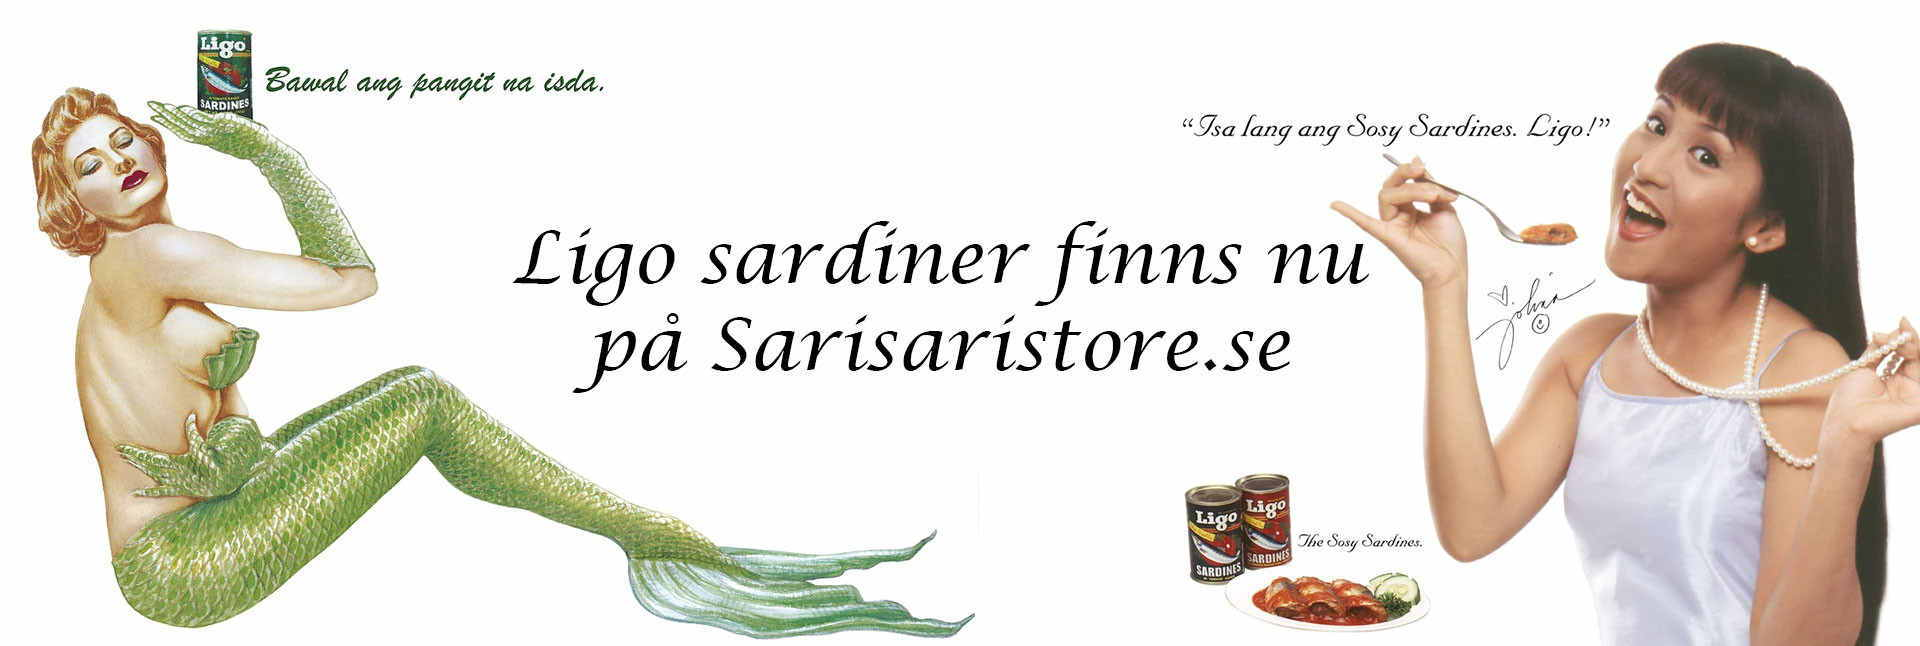 Ligo sardiner, riktigt gott!